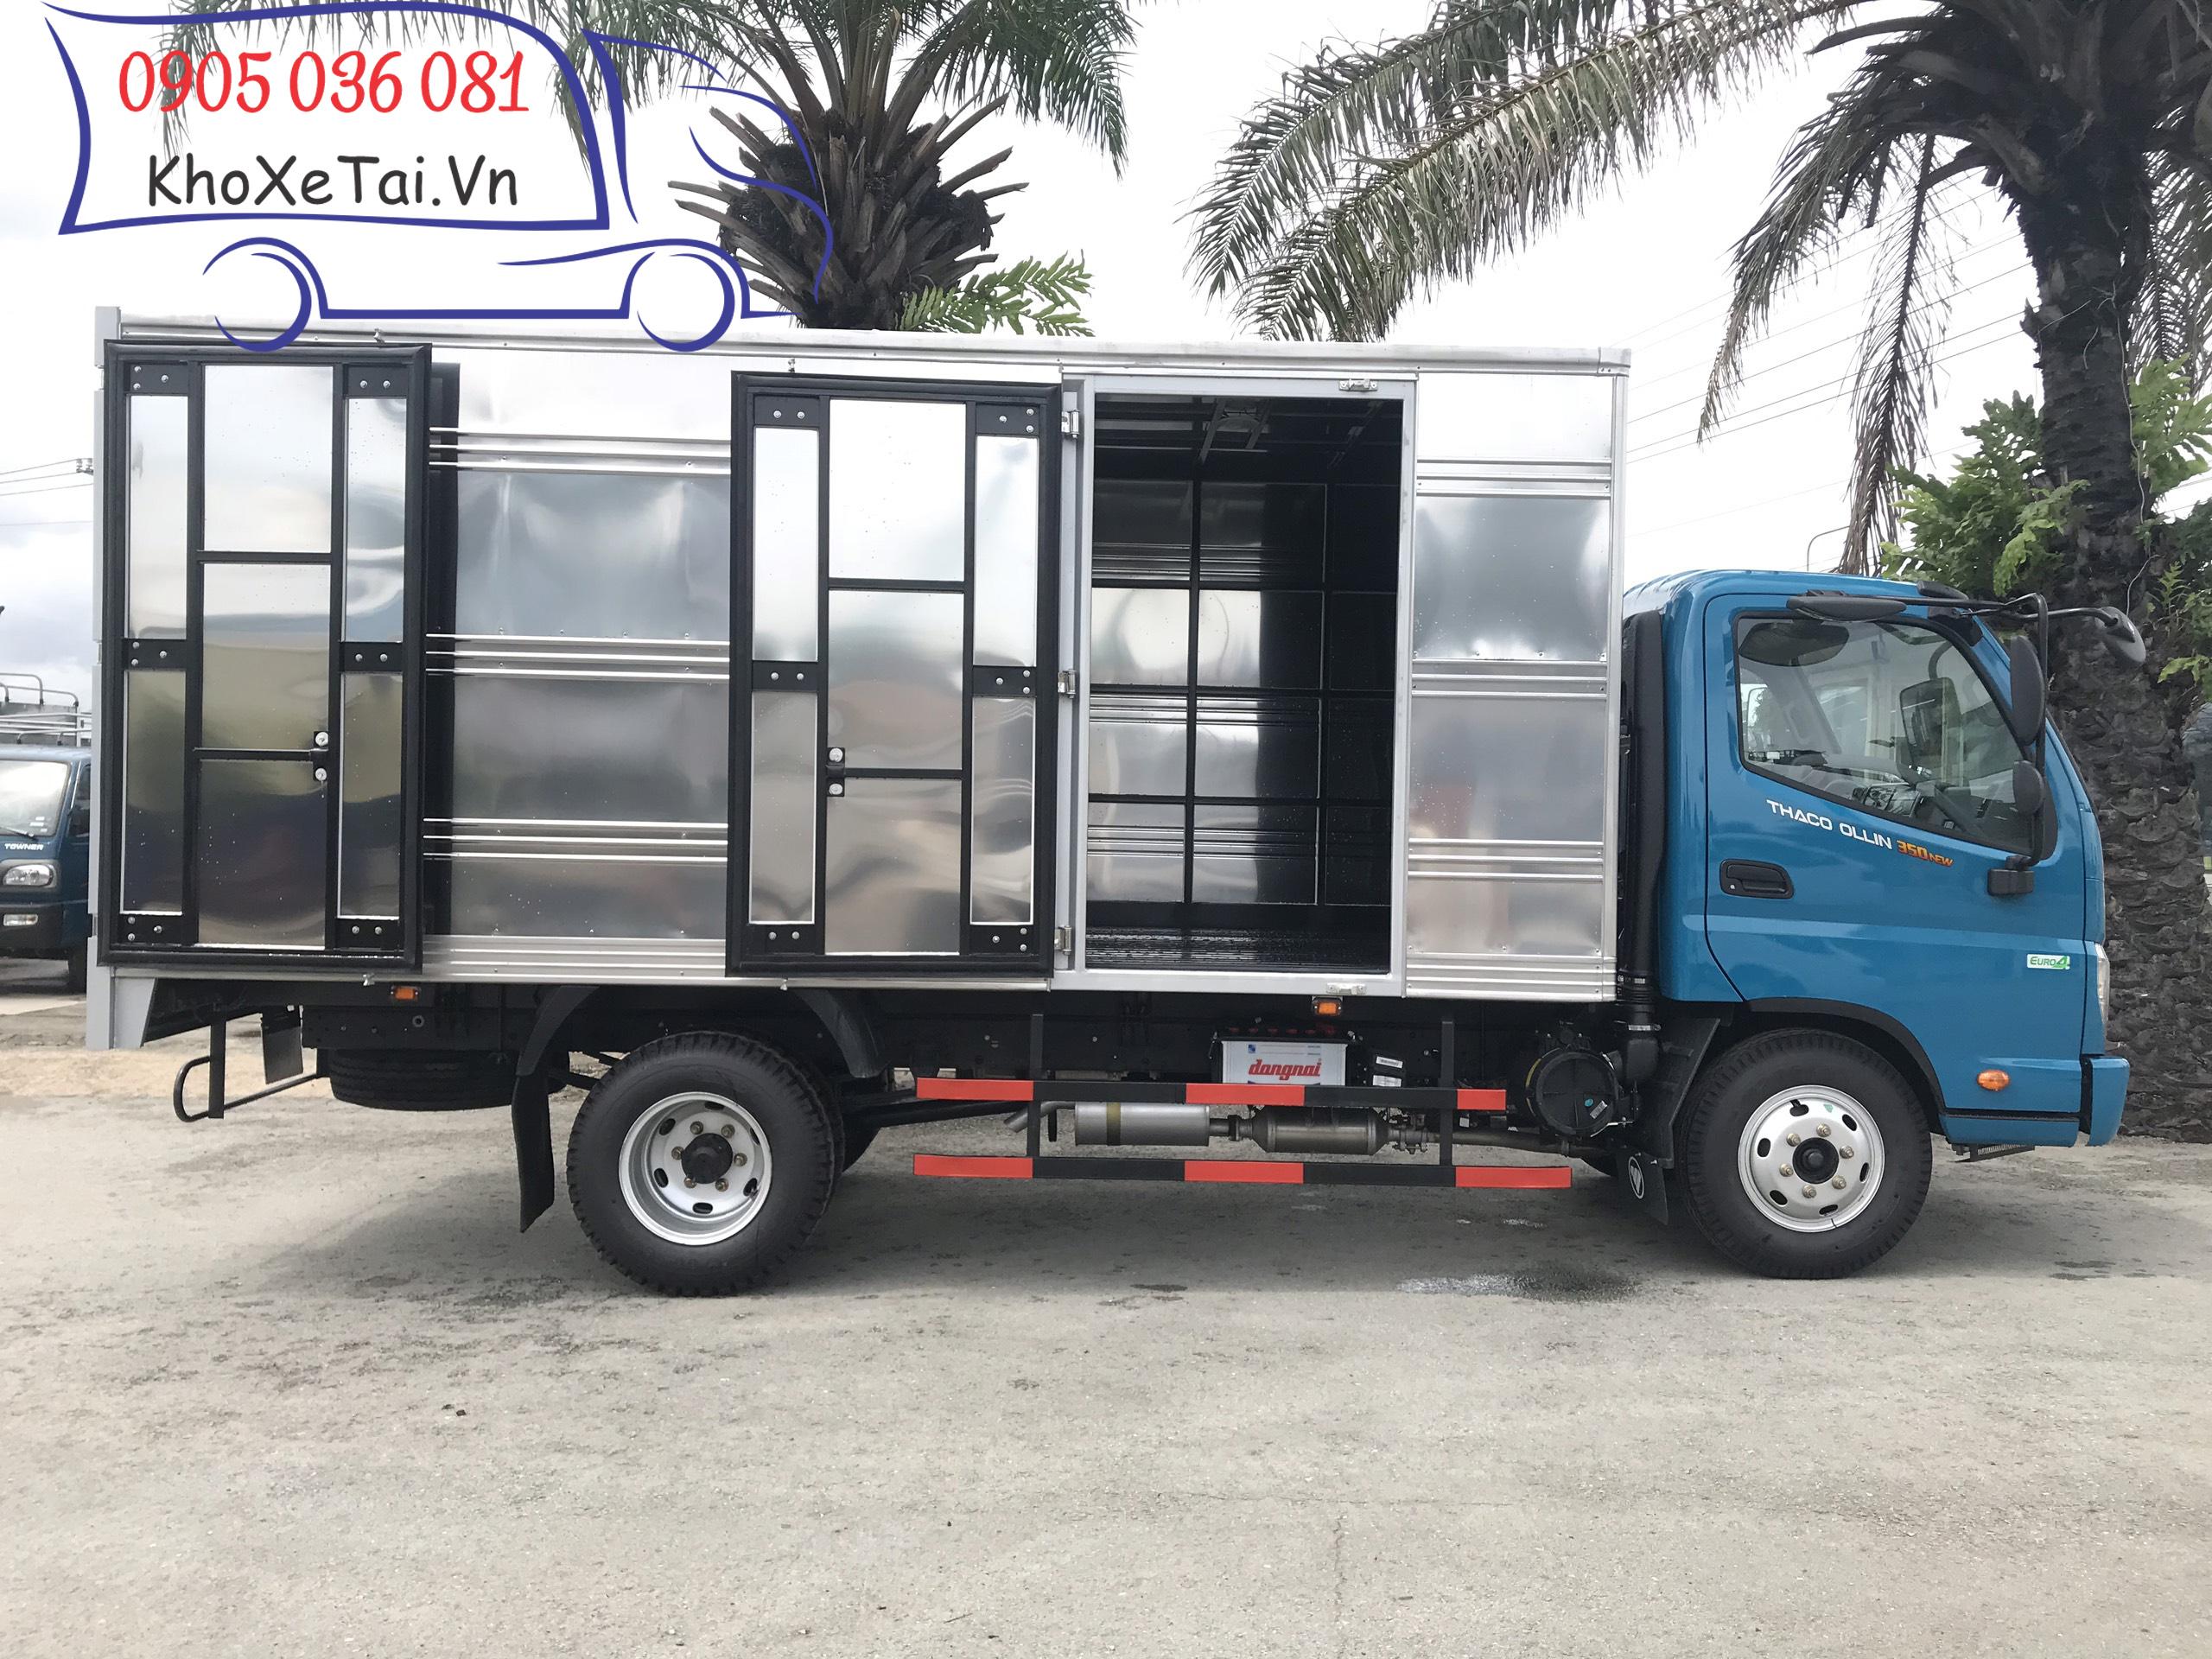 xe tải thaco ollin 350 e4 thùng kín 3,5 tấn